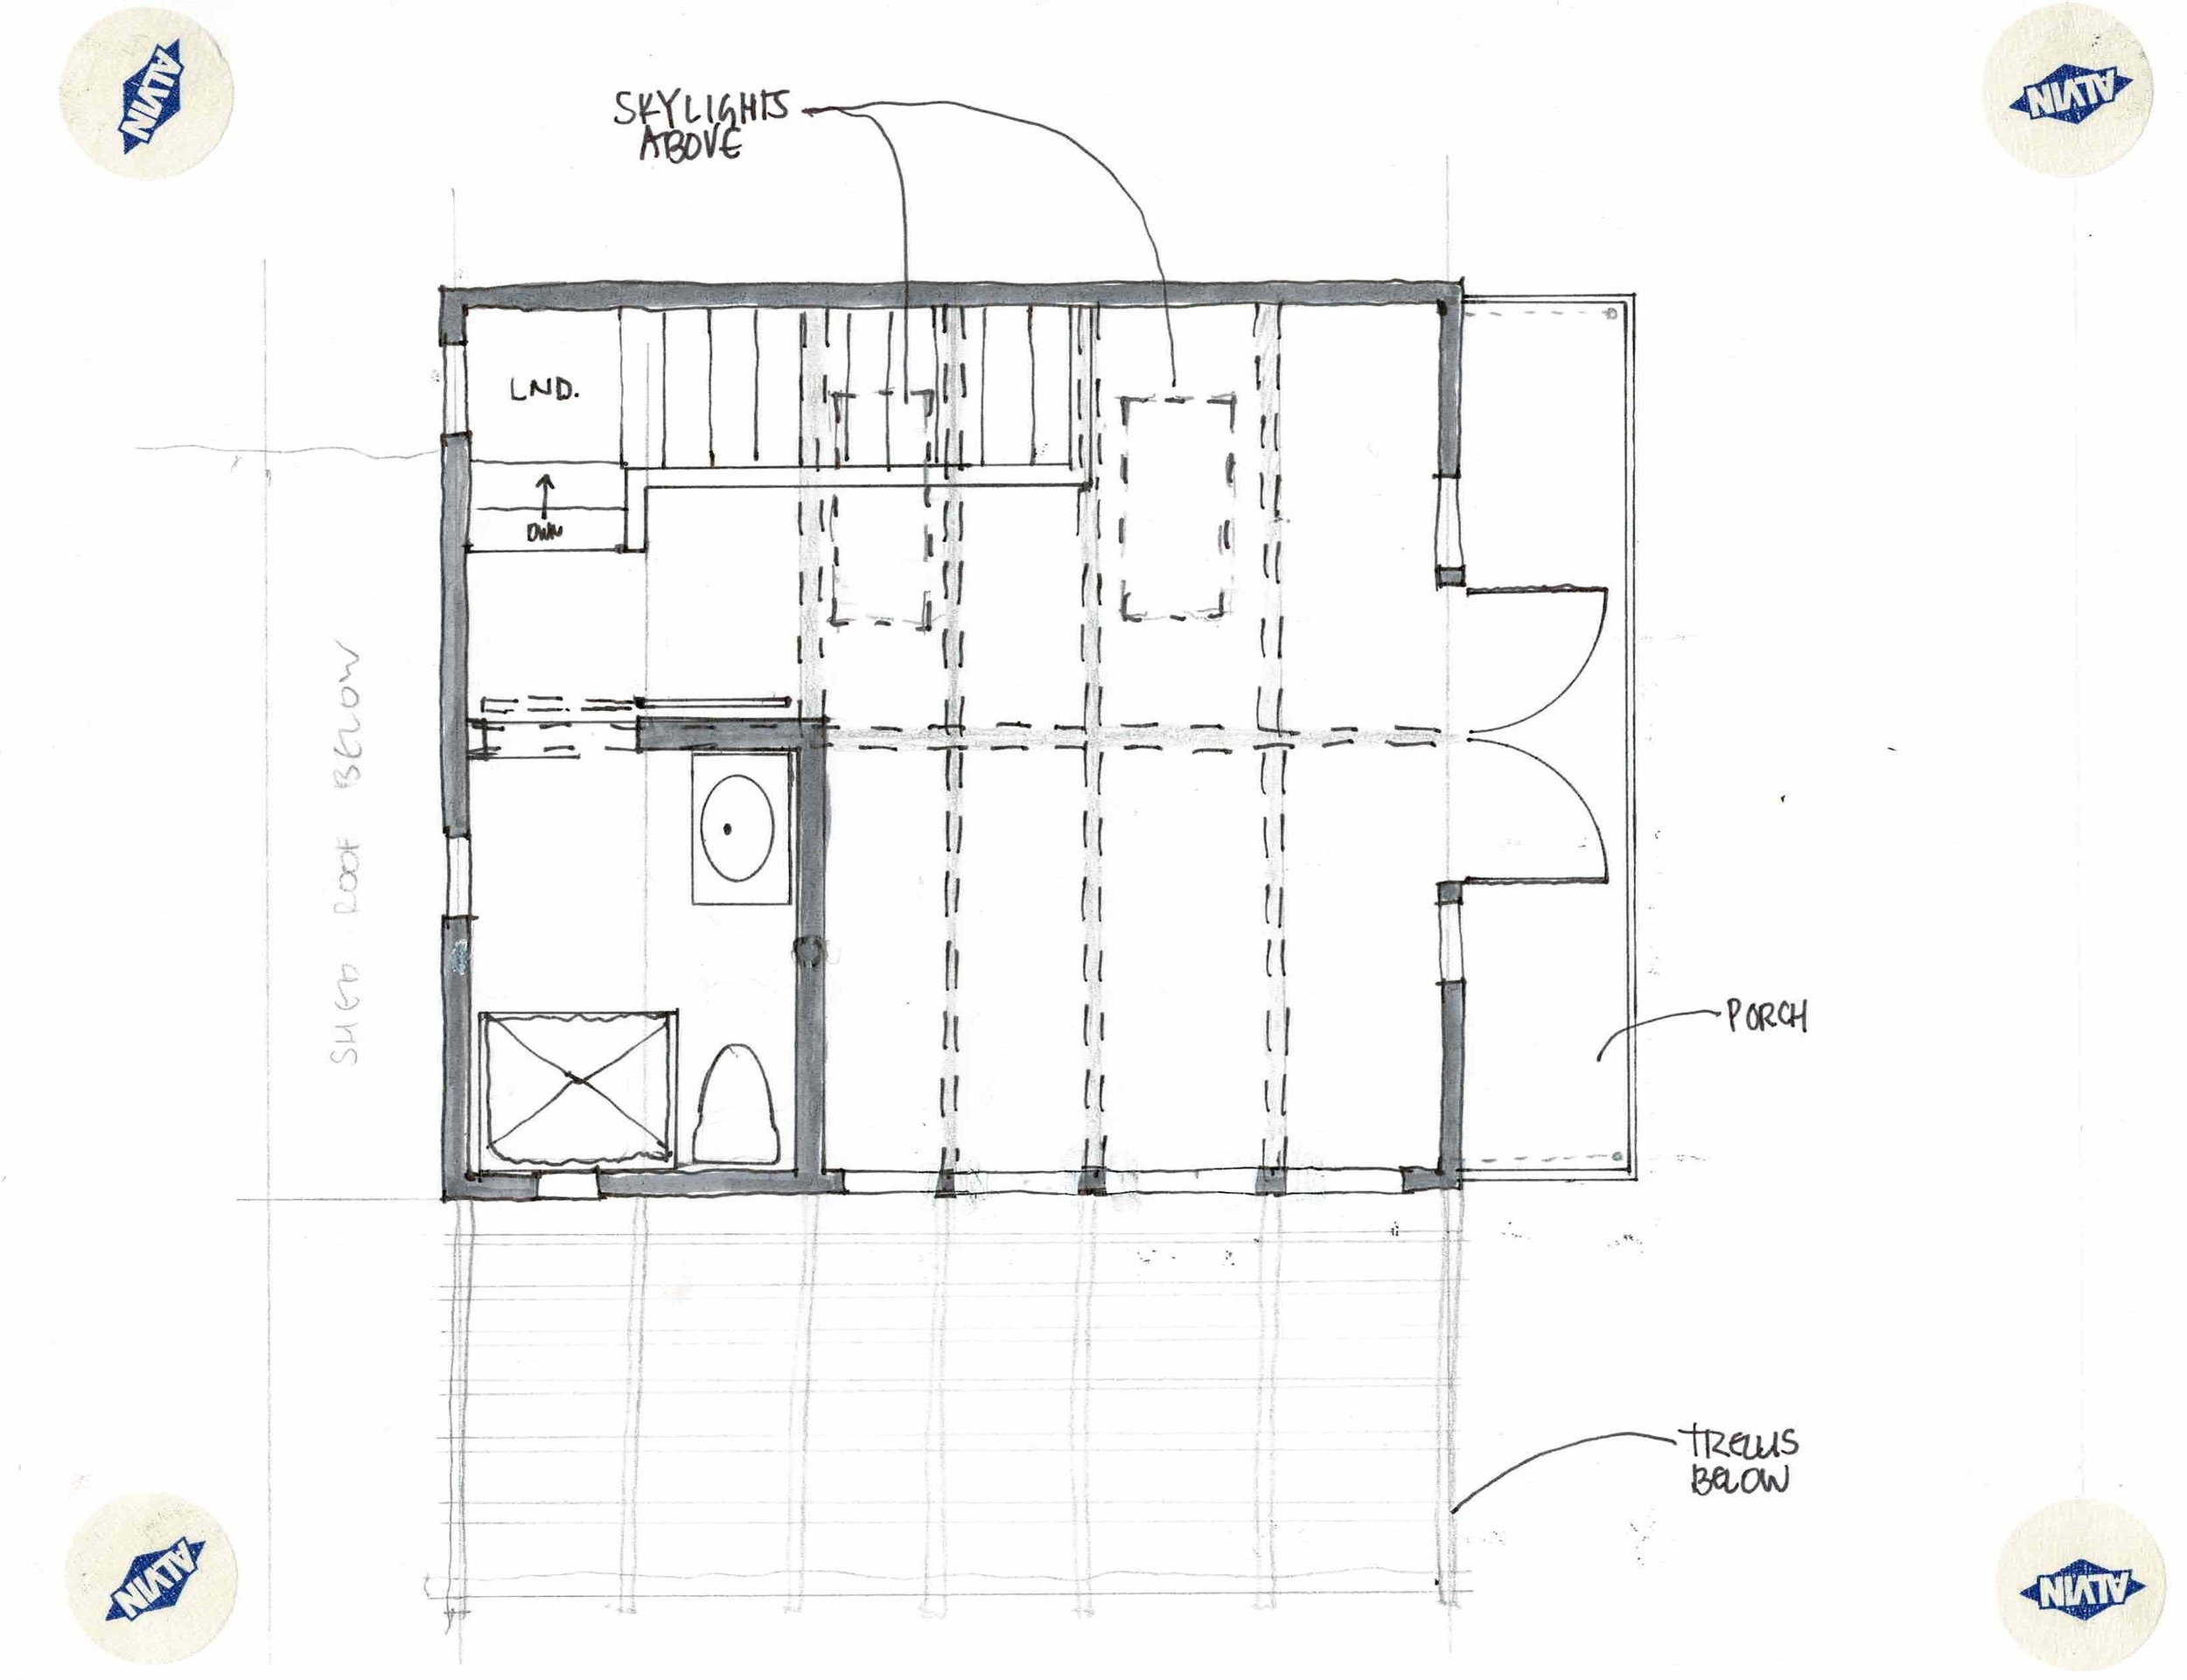 recreation-building-sketch-floor-plan.jpeg